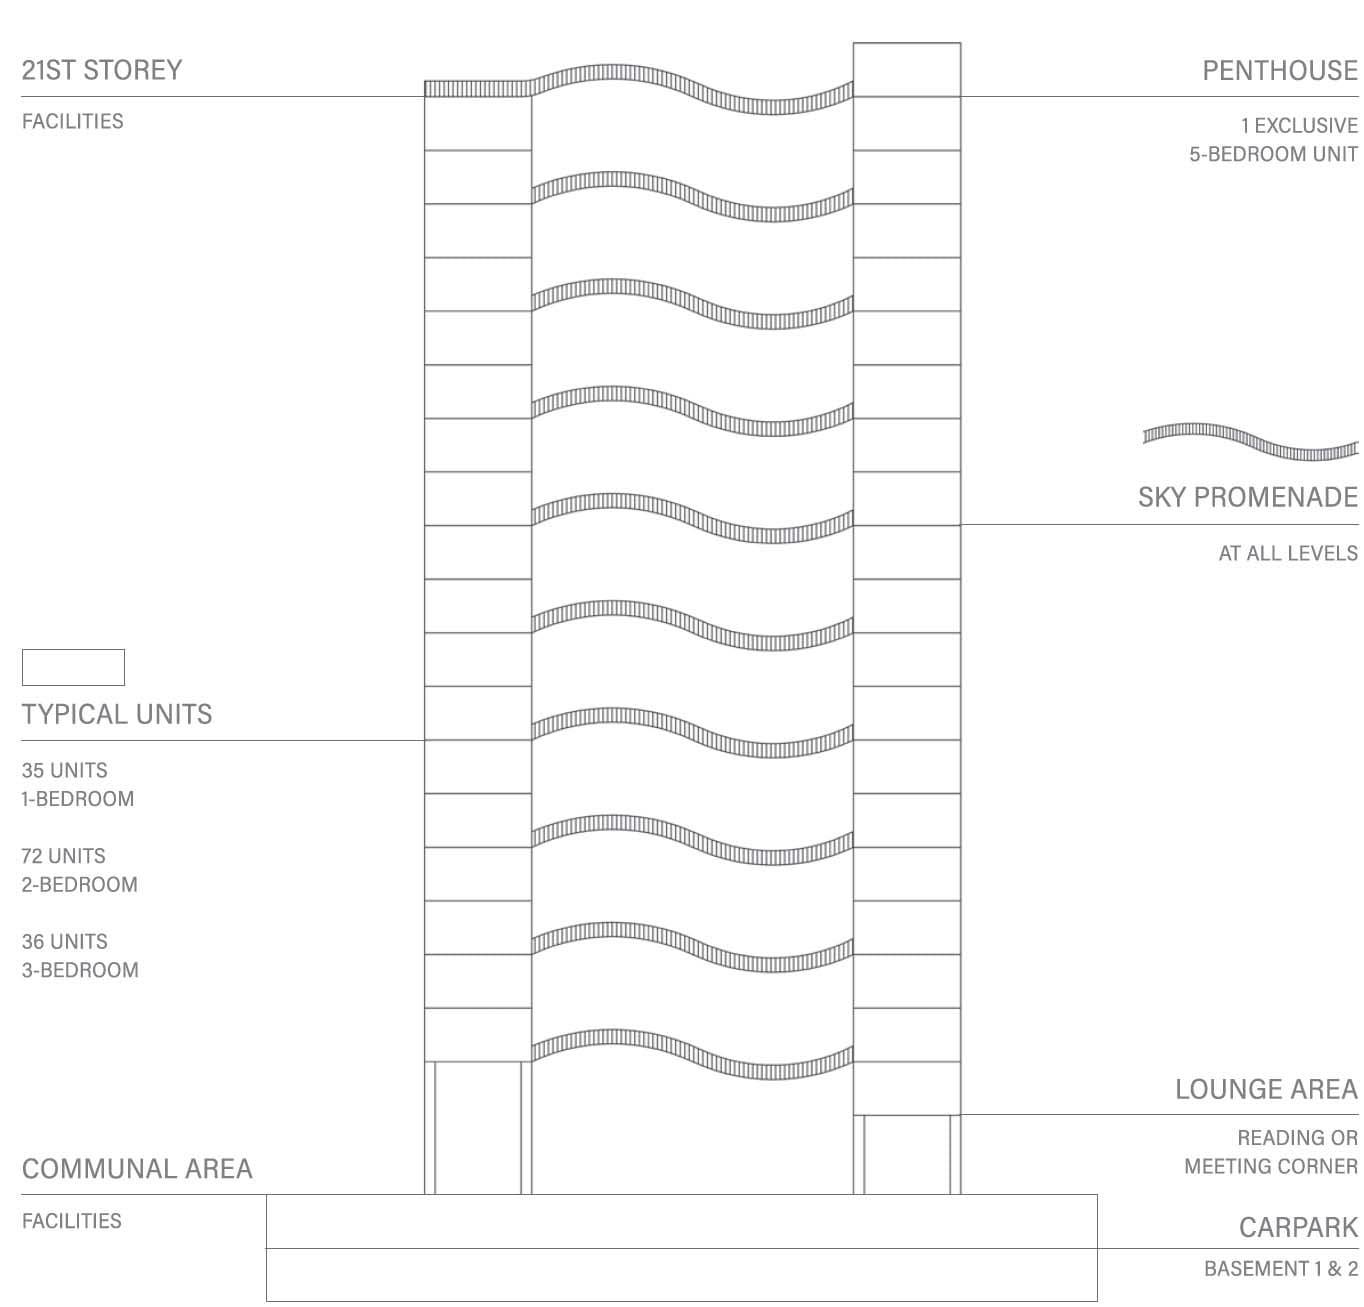 Coastline-Residences-structure